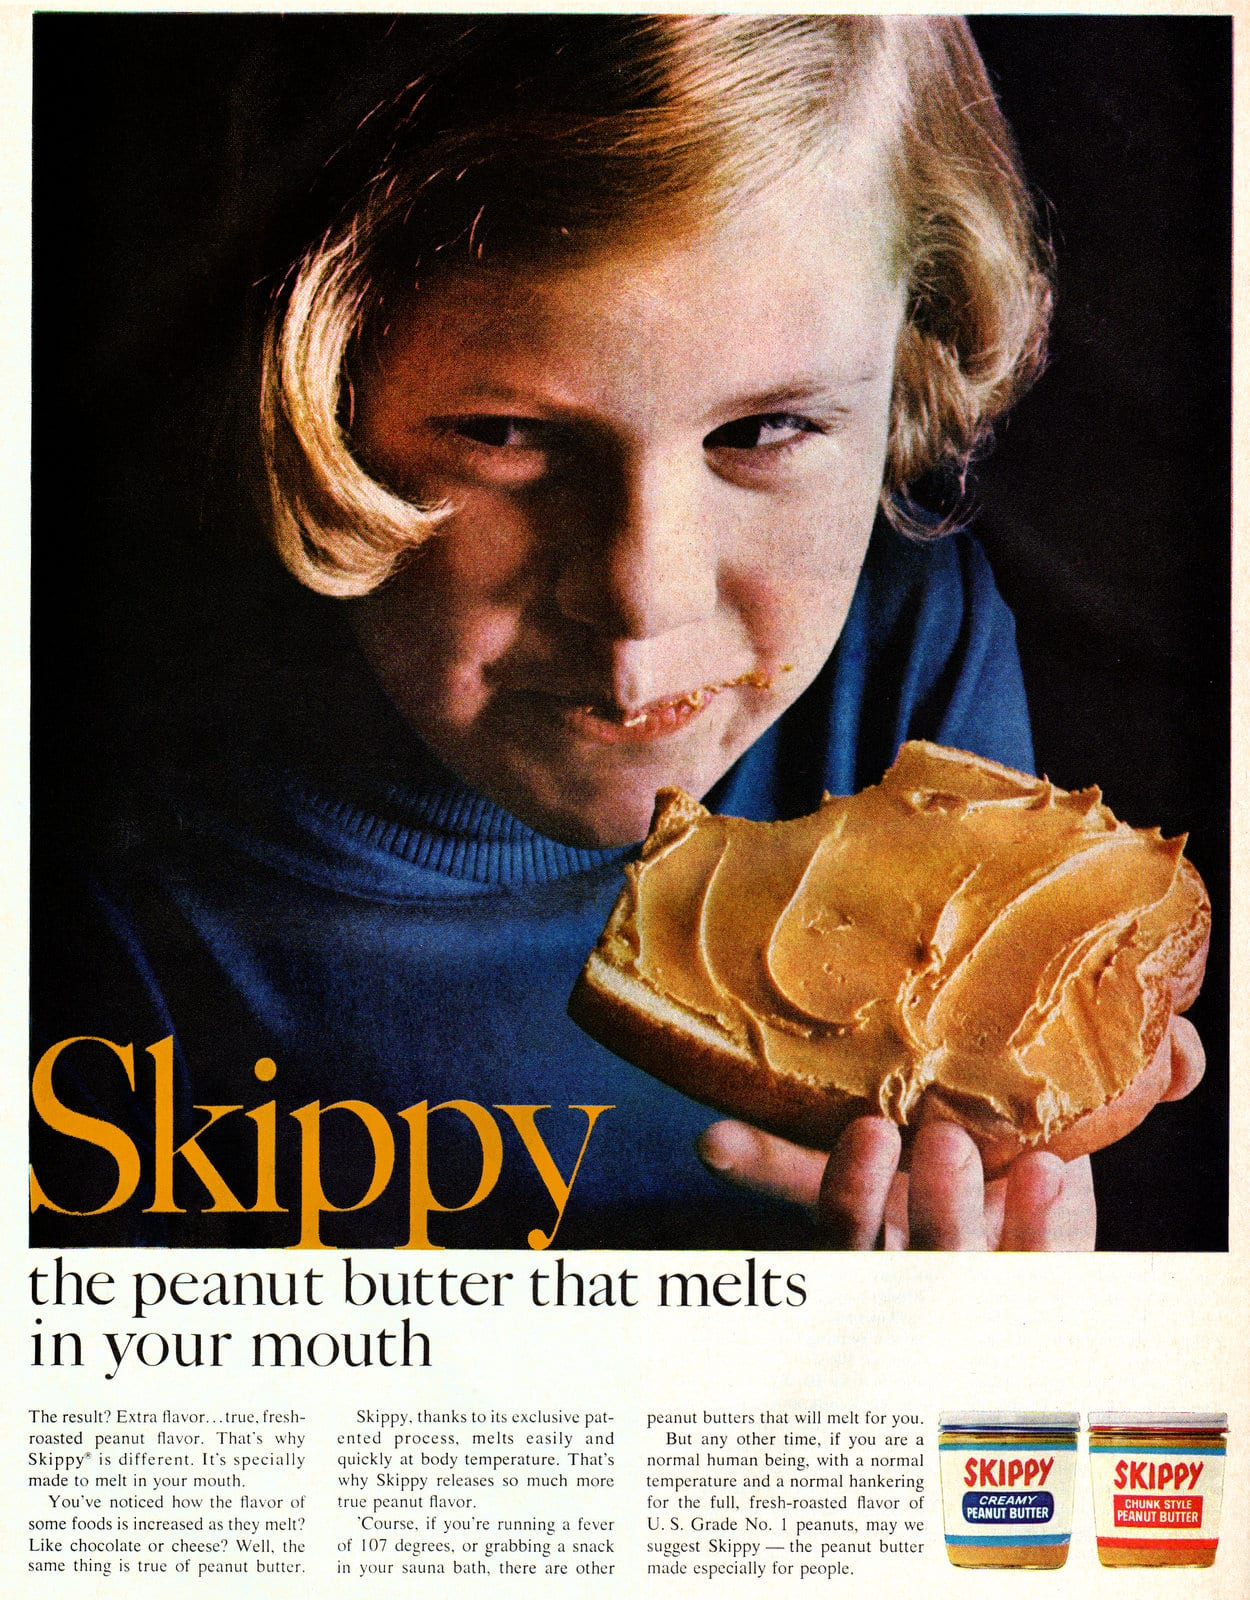 Vintage Skippy Peanut Butter ad (1966)